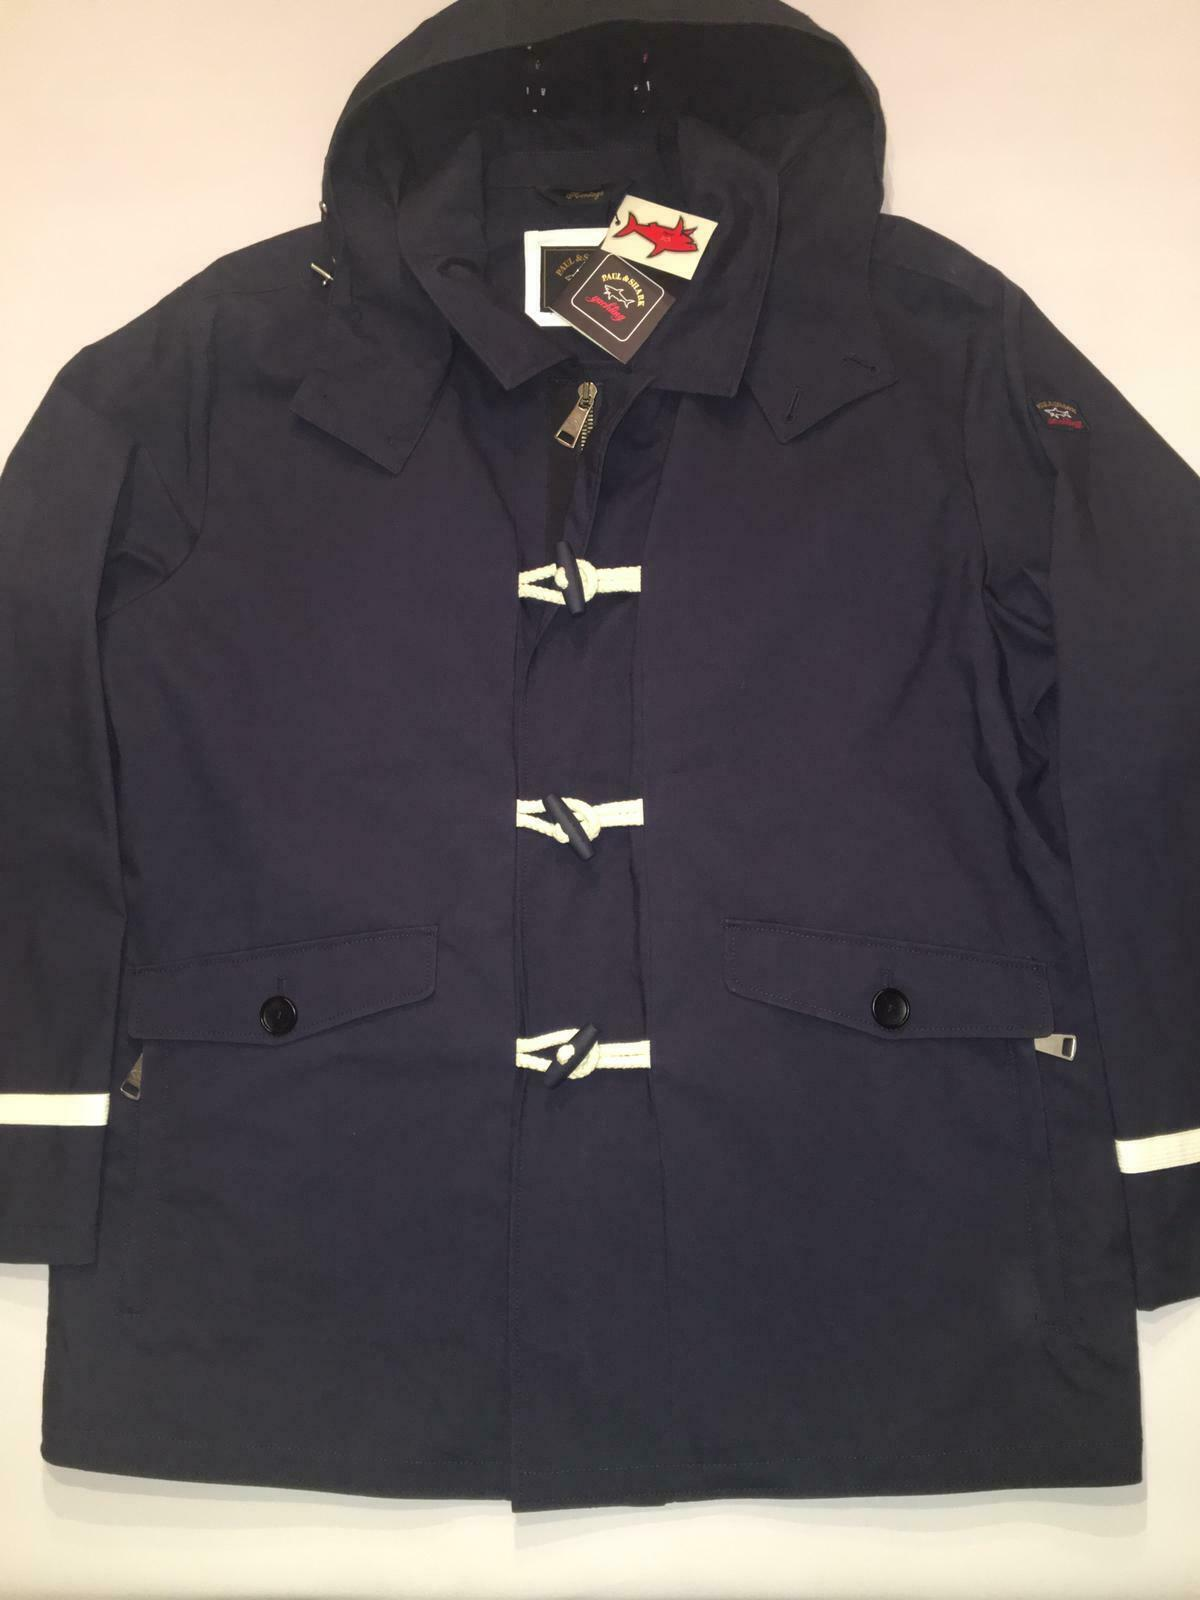 NEW Paul & Shark Jacket Giacca Uomo Uomo Cotton blu blu blu NAVY HERITAGE COLLECTION 3XL 2a5c45